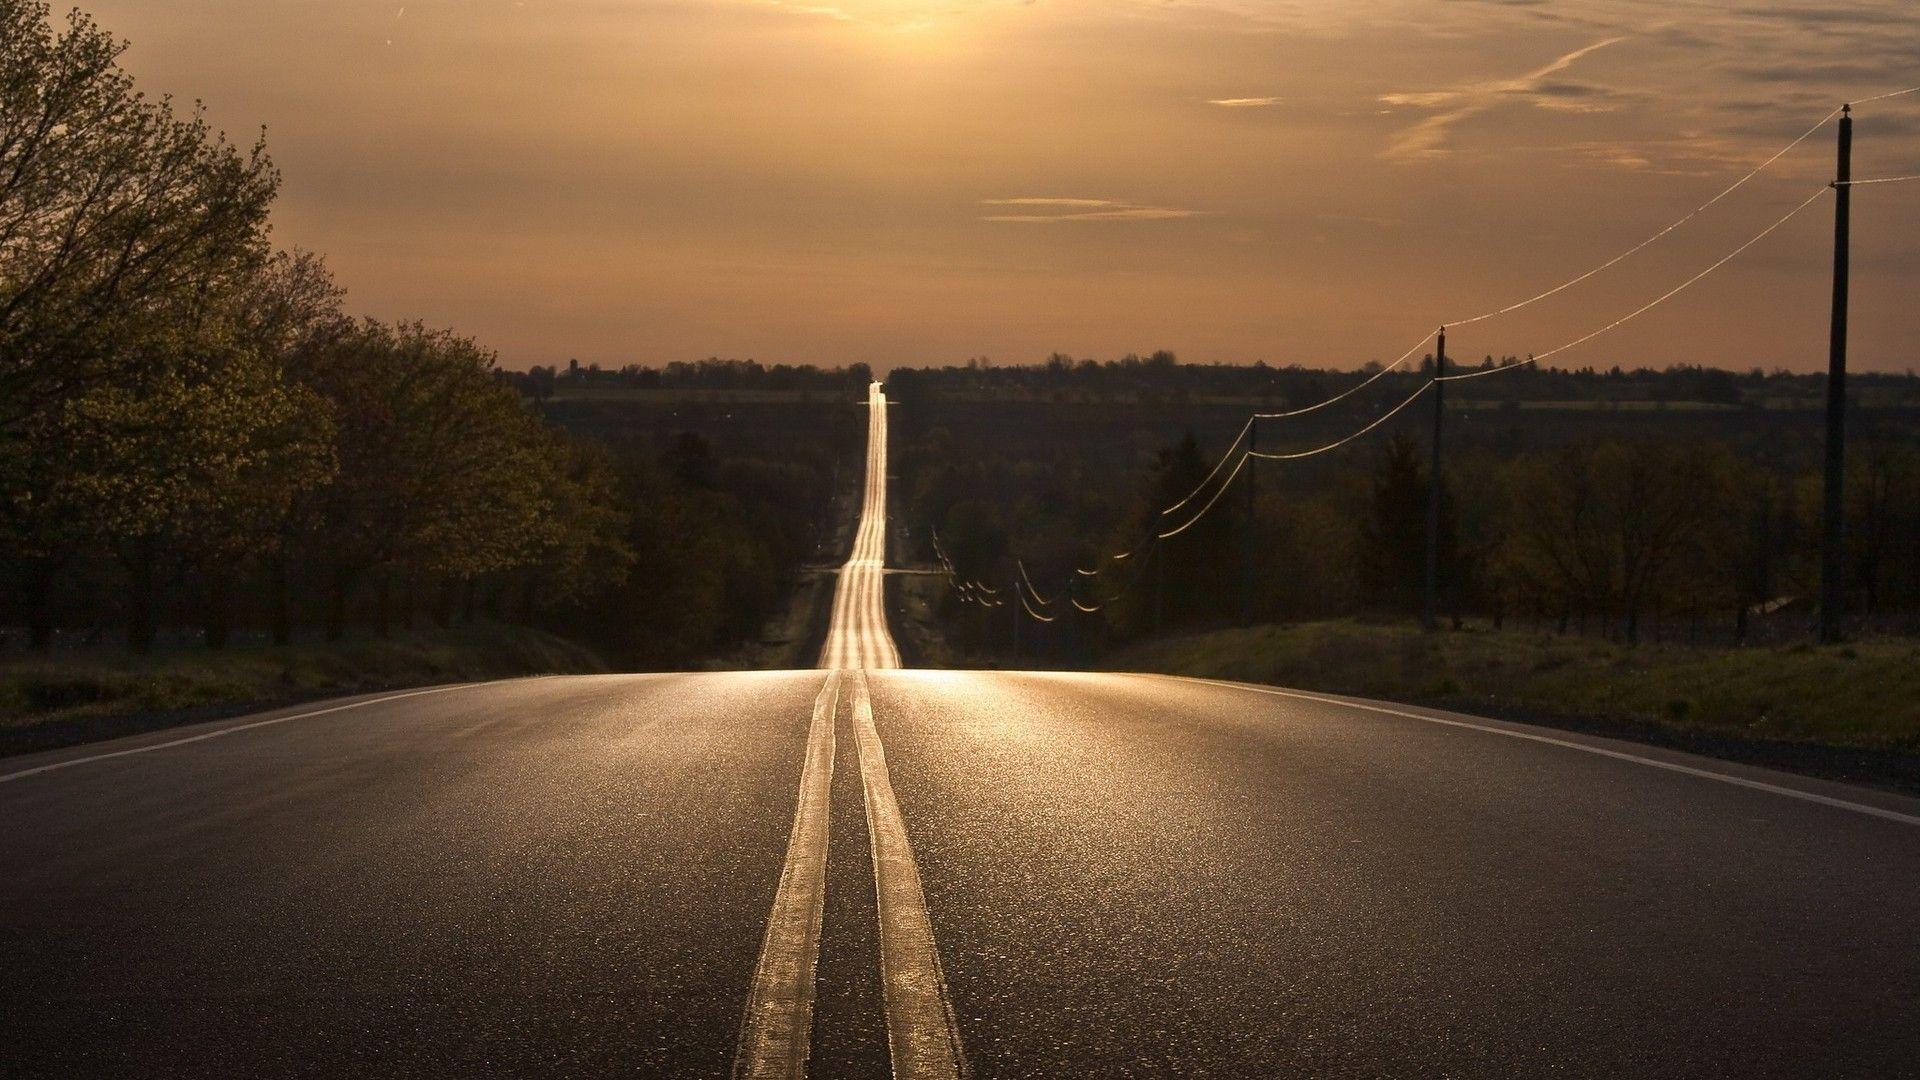 Endless Country Road Sunset Desktop Wallpaper